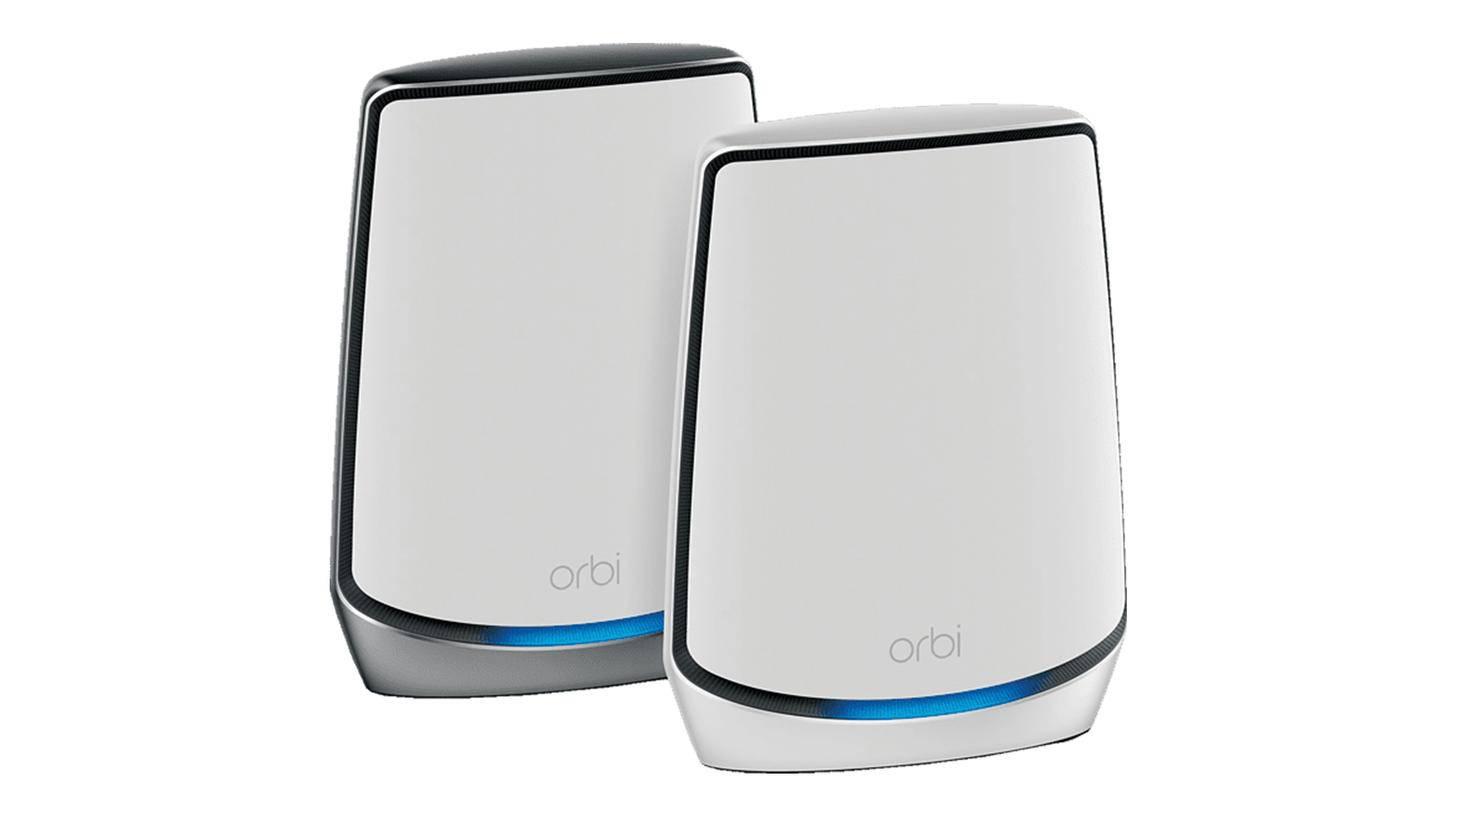 wlan-repeater-wifi-6-System-netgear-orbi-rbk852_100eus_ax6000